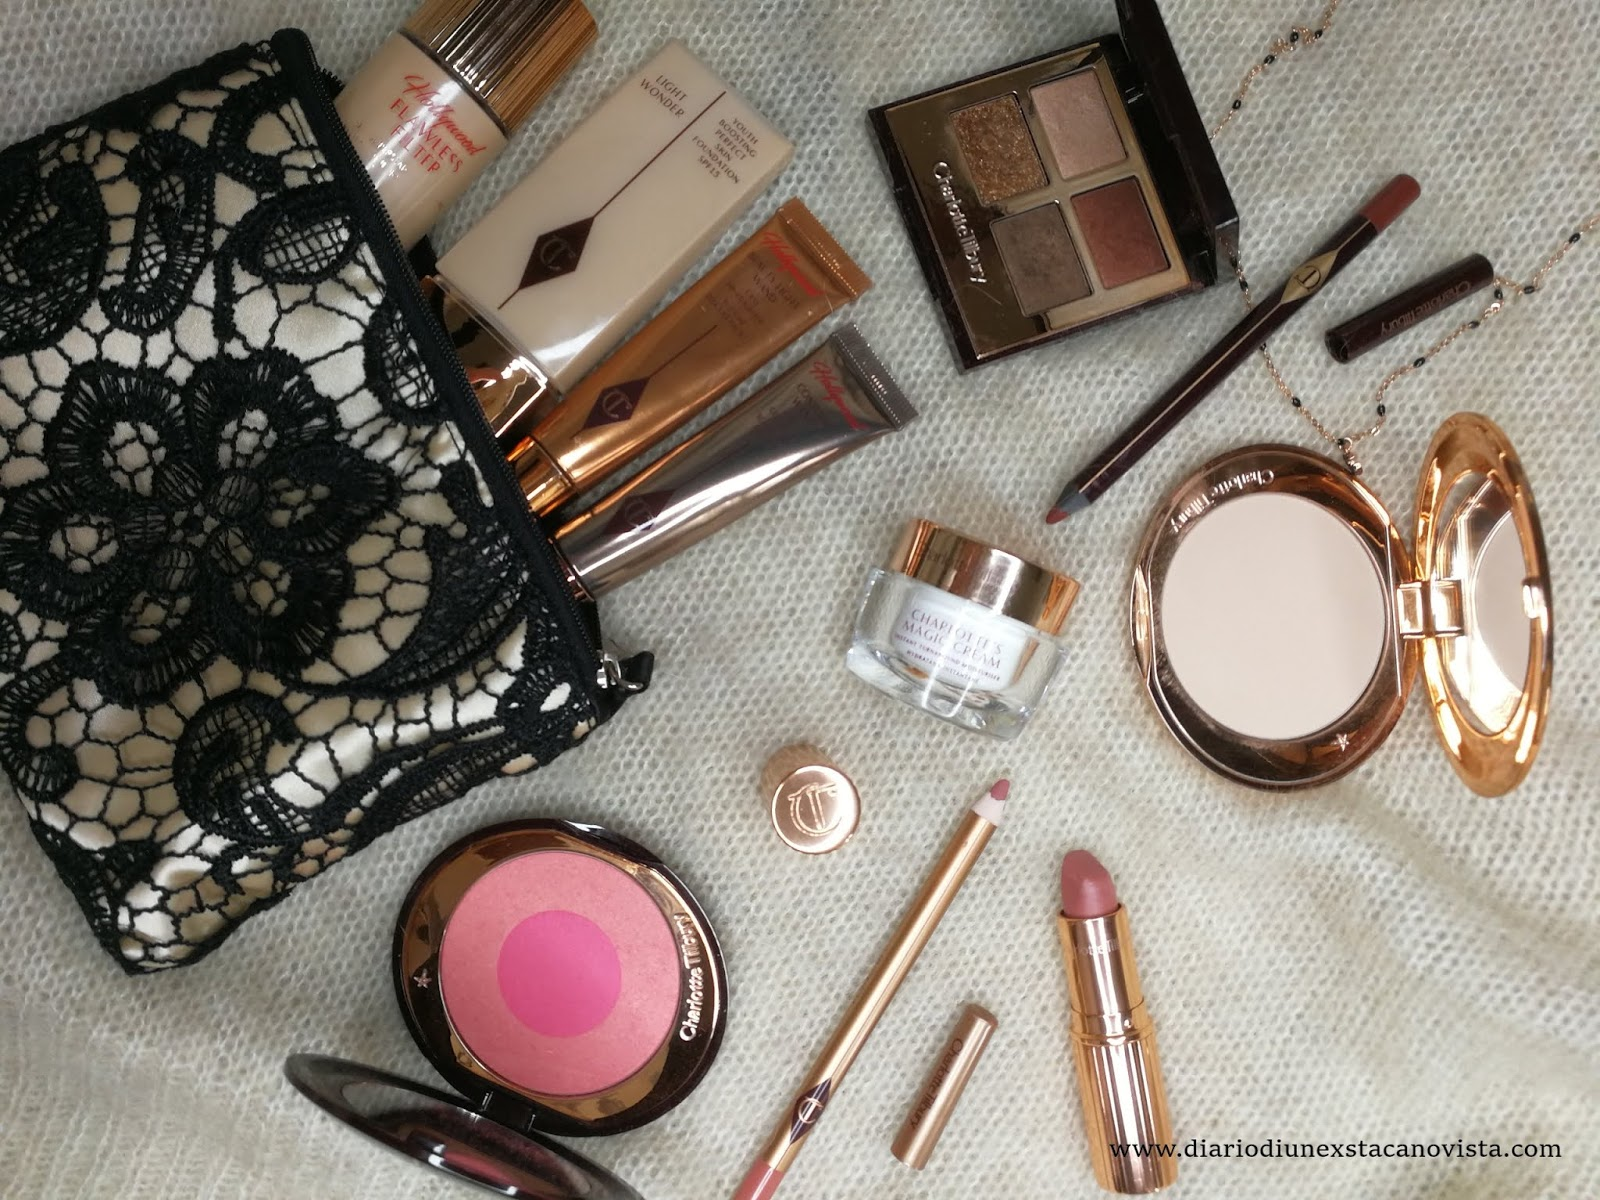 BELLEZZA | Charlotte Tilbury Brand Review